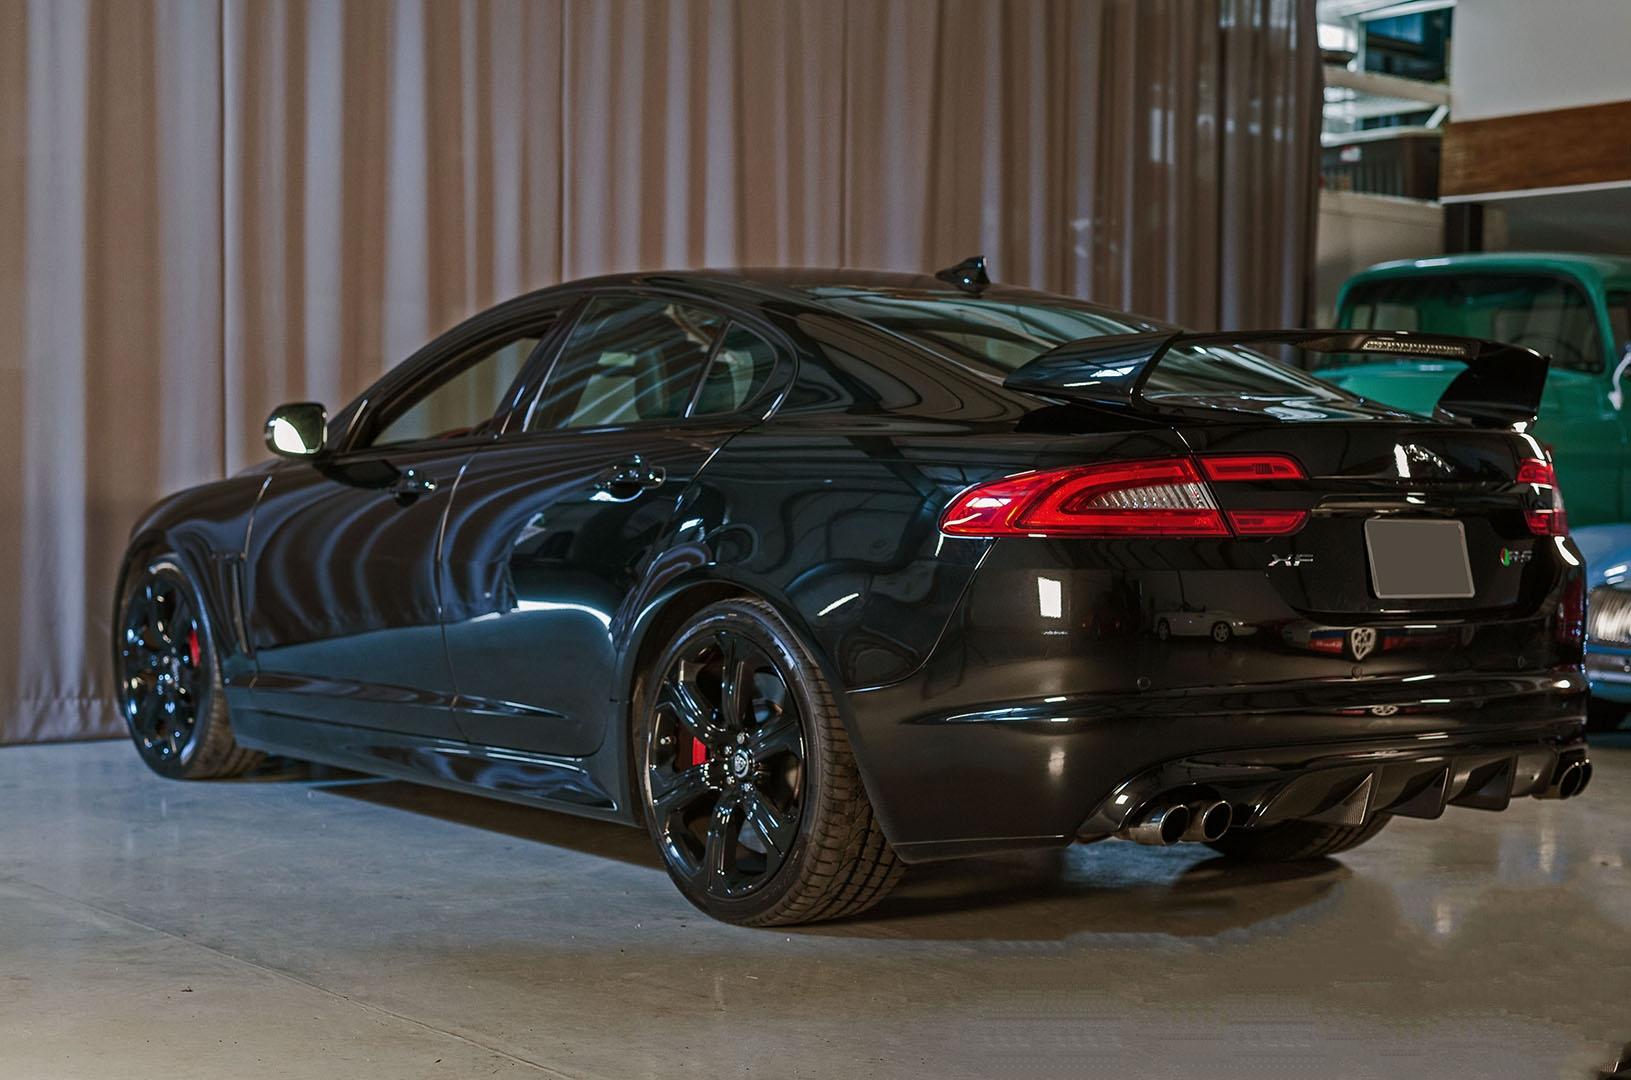 2013A_Jaguar_XFR-S_Black_006.jpg